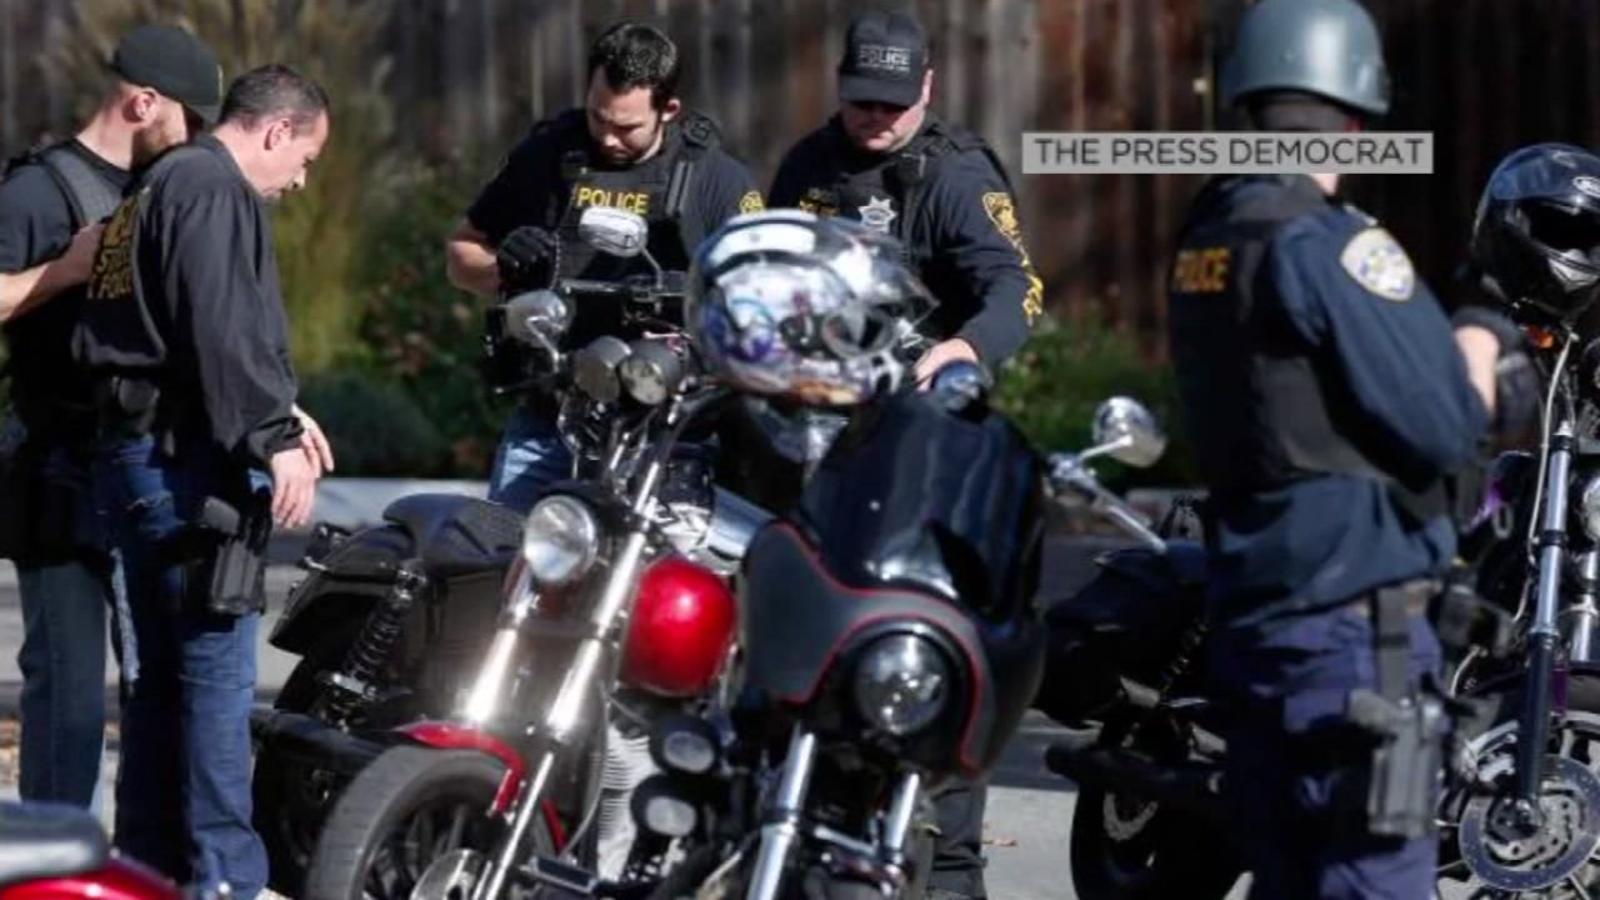 11 CA Hells Angels members indicted for racketeering, extortion, murder